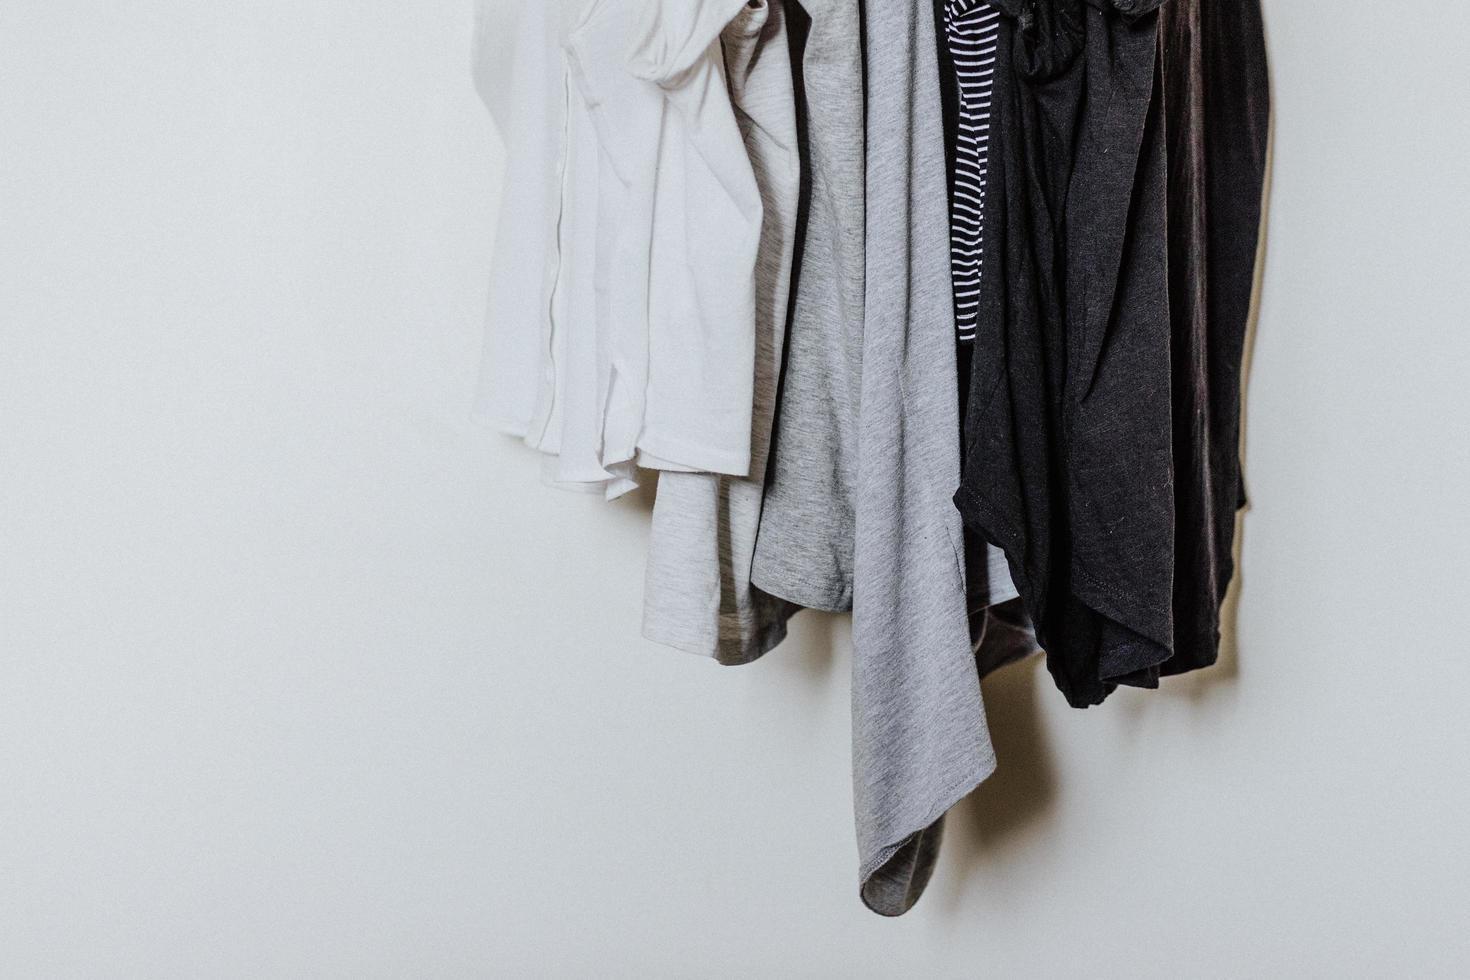 t-shirt impiccate su sfondo bianco foto